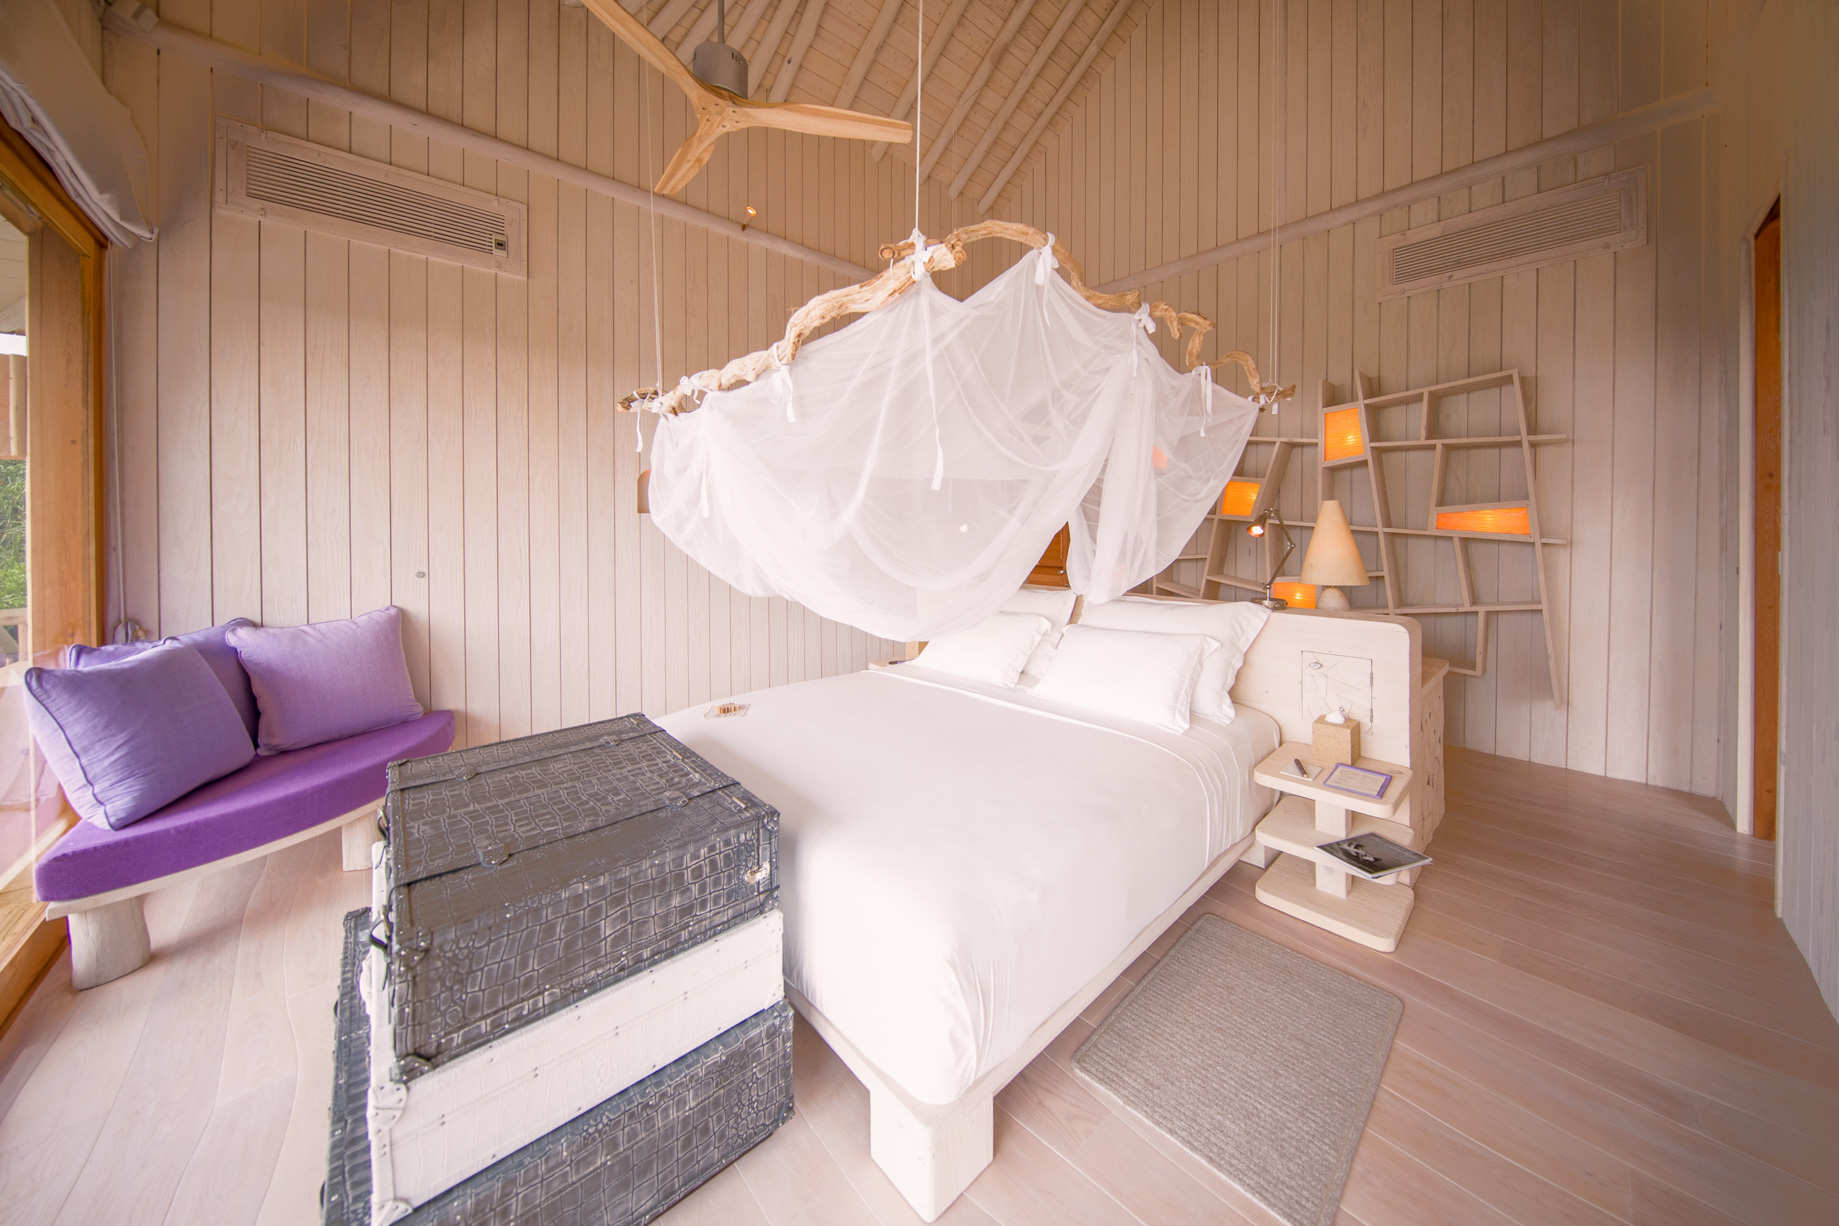 Soneva Jani Luxury Resort – Noonu Atoll, Medhufaru, Maldives – 2 Bedroom Crusoe Residence Island Villa Upper Deck Bedroom